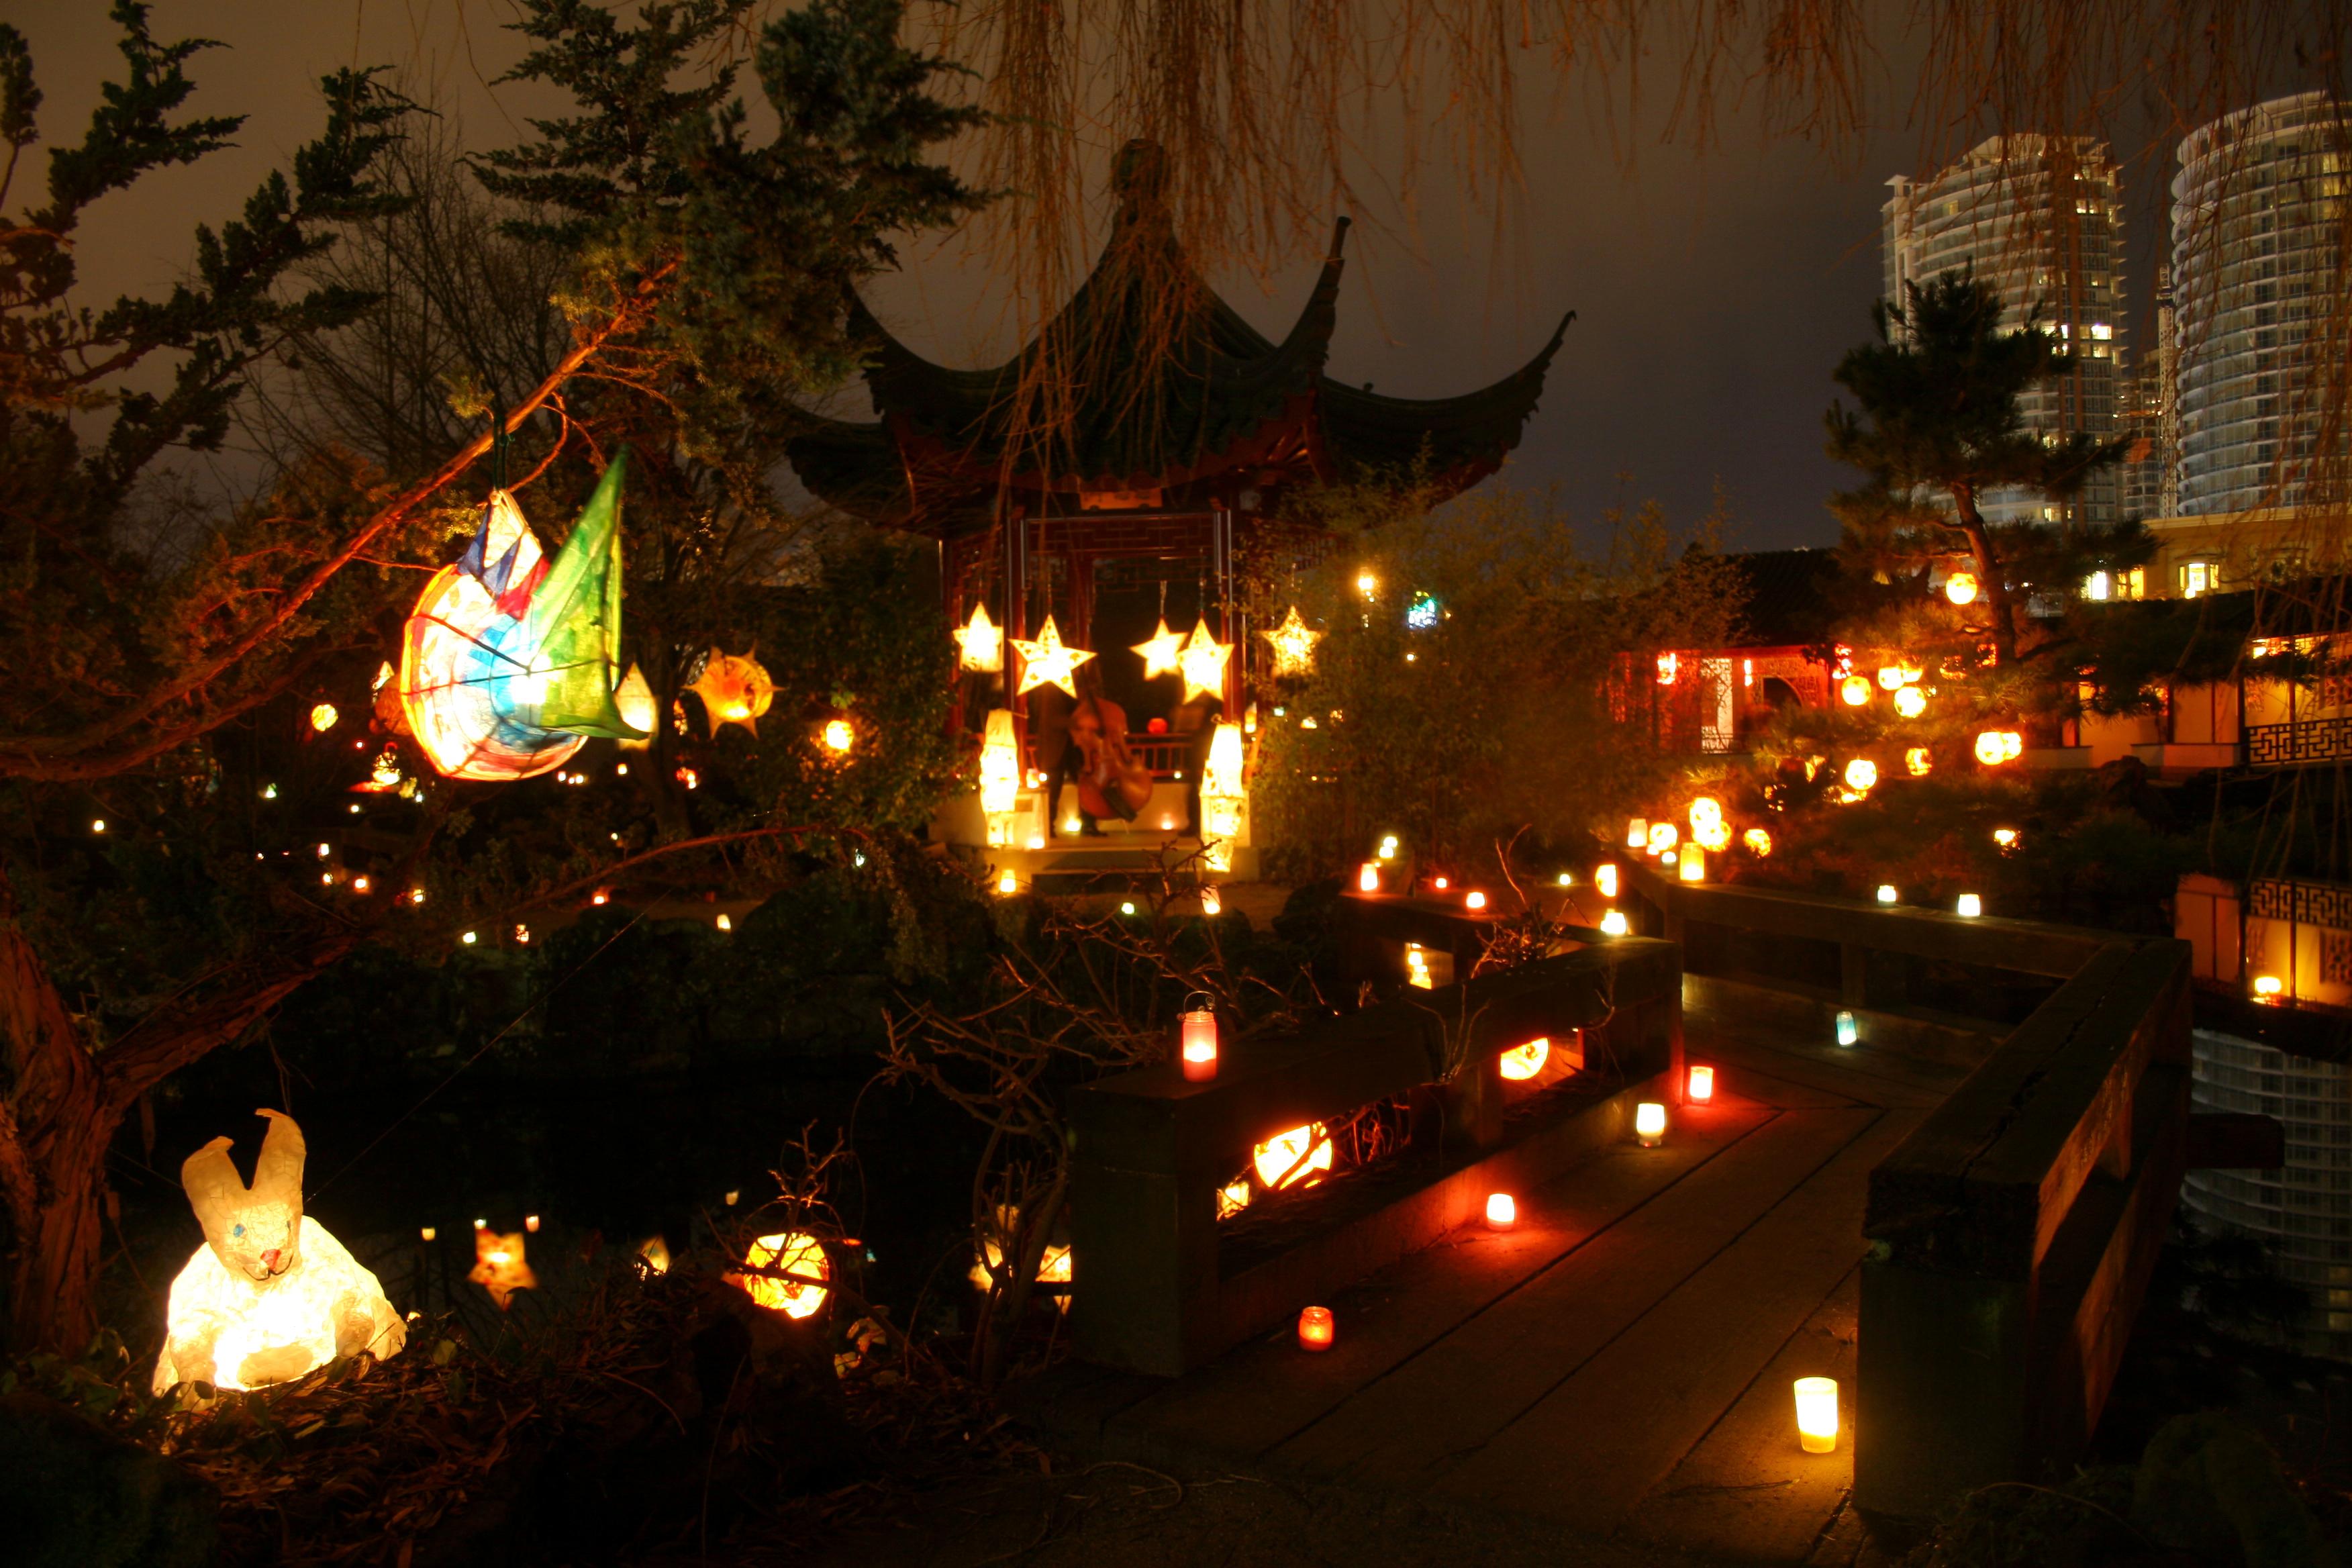 2012 Winter Solstice Lantern Festival - December 21, 2012